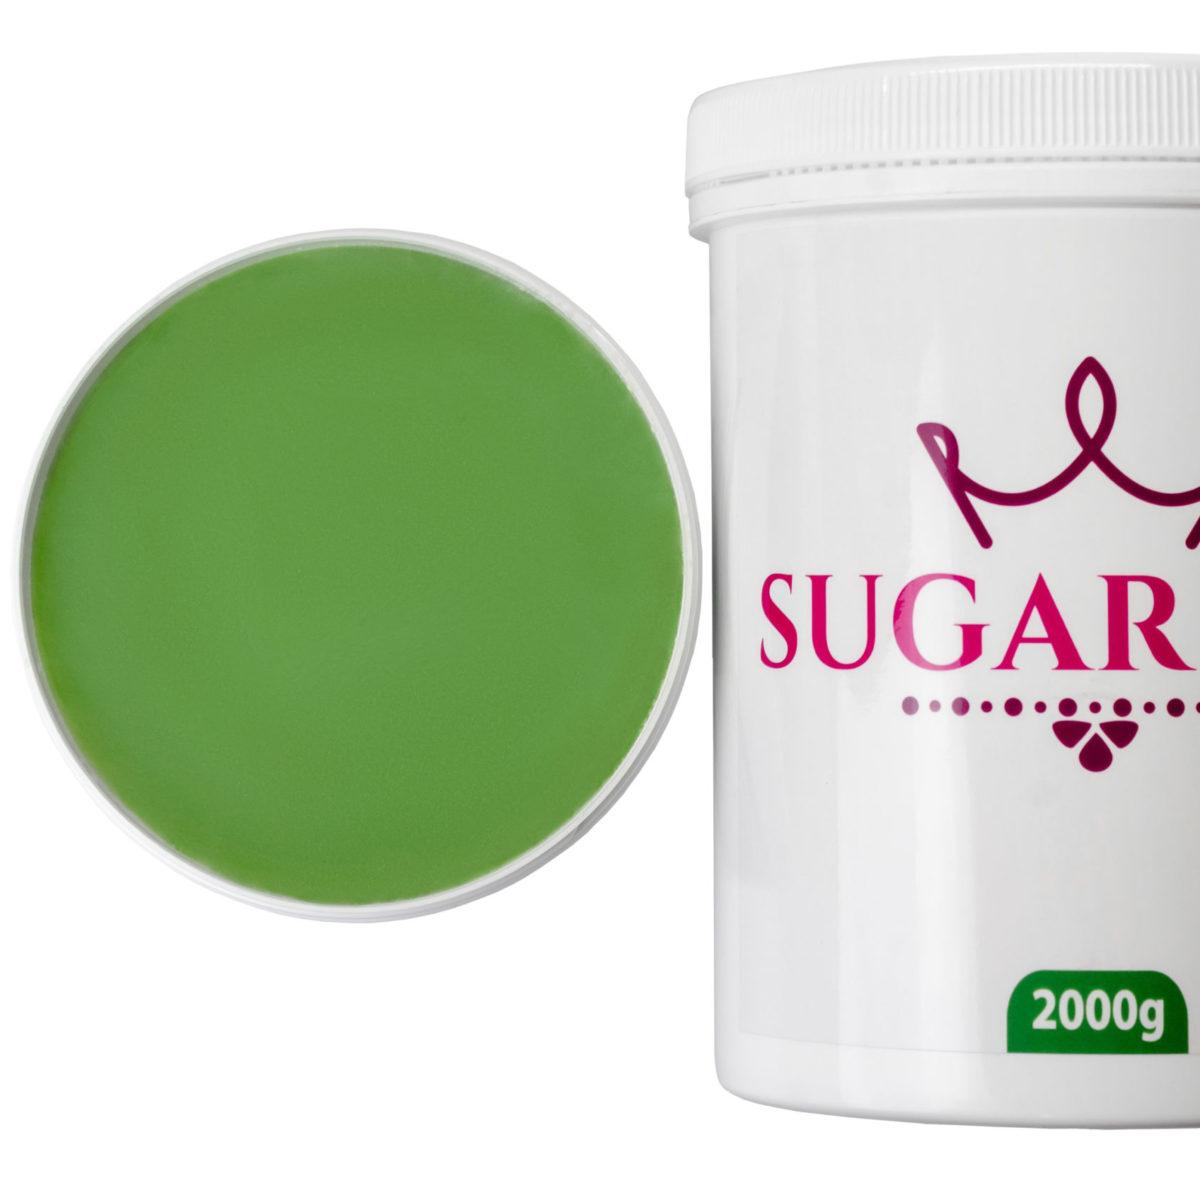 Паста Sugarlen (2000 гр.) - зелена